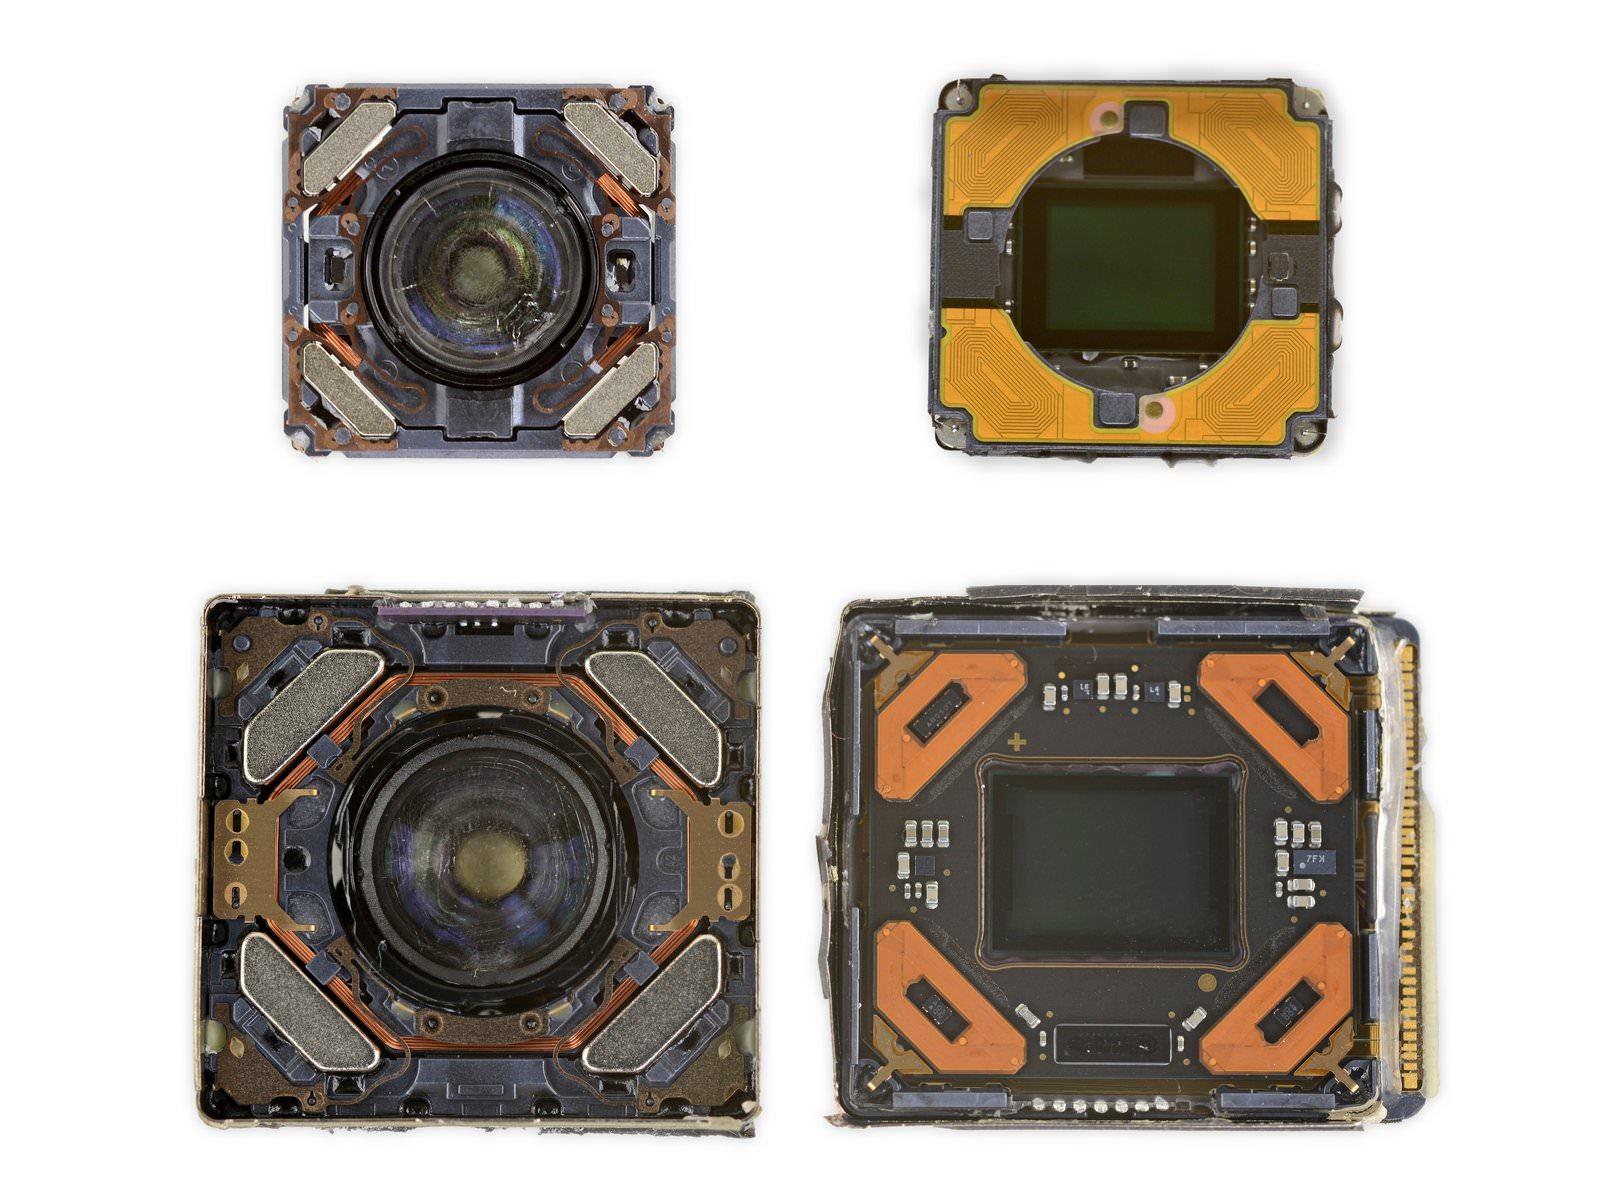 camera-sensor-comarison.jpg